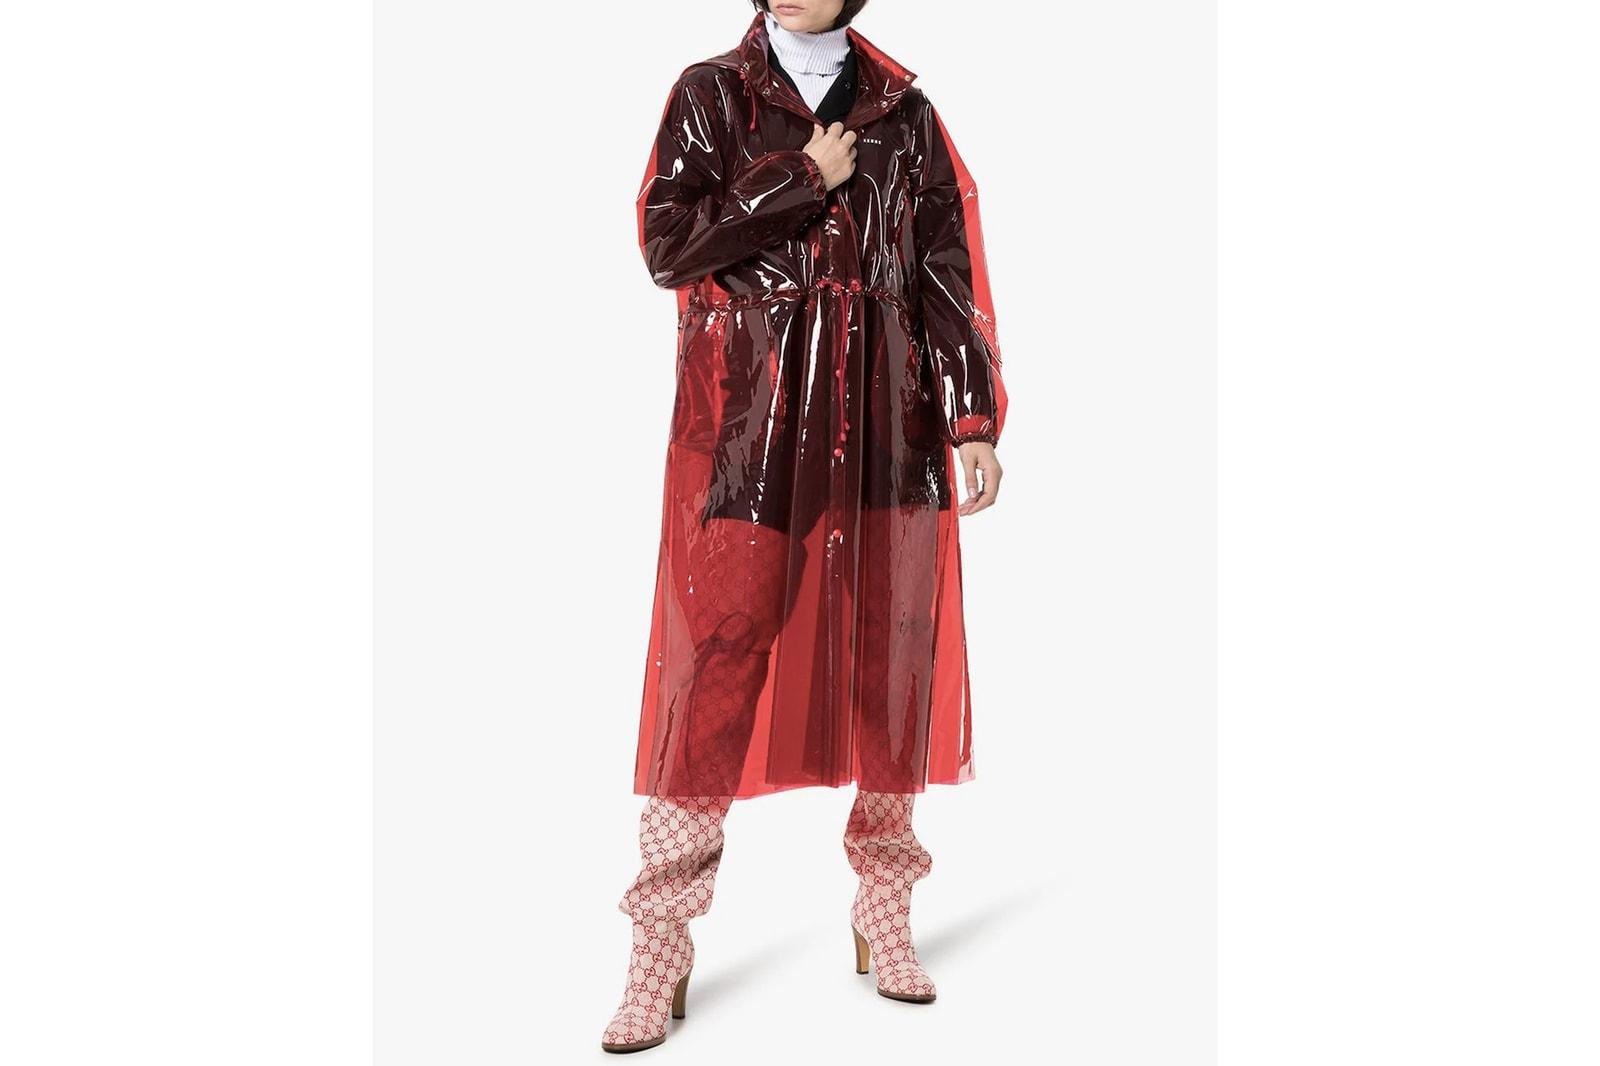 Festival Fashion Season Boots Coats Rain Balenciaga GANNI Burberry Marine Serre Rains Jacket Wellies